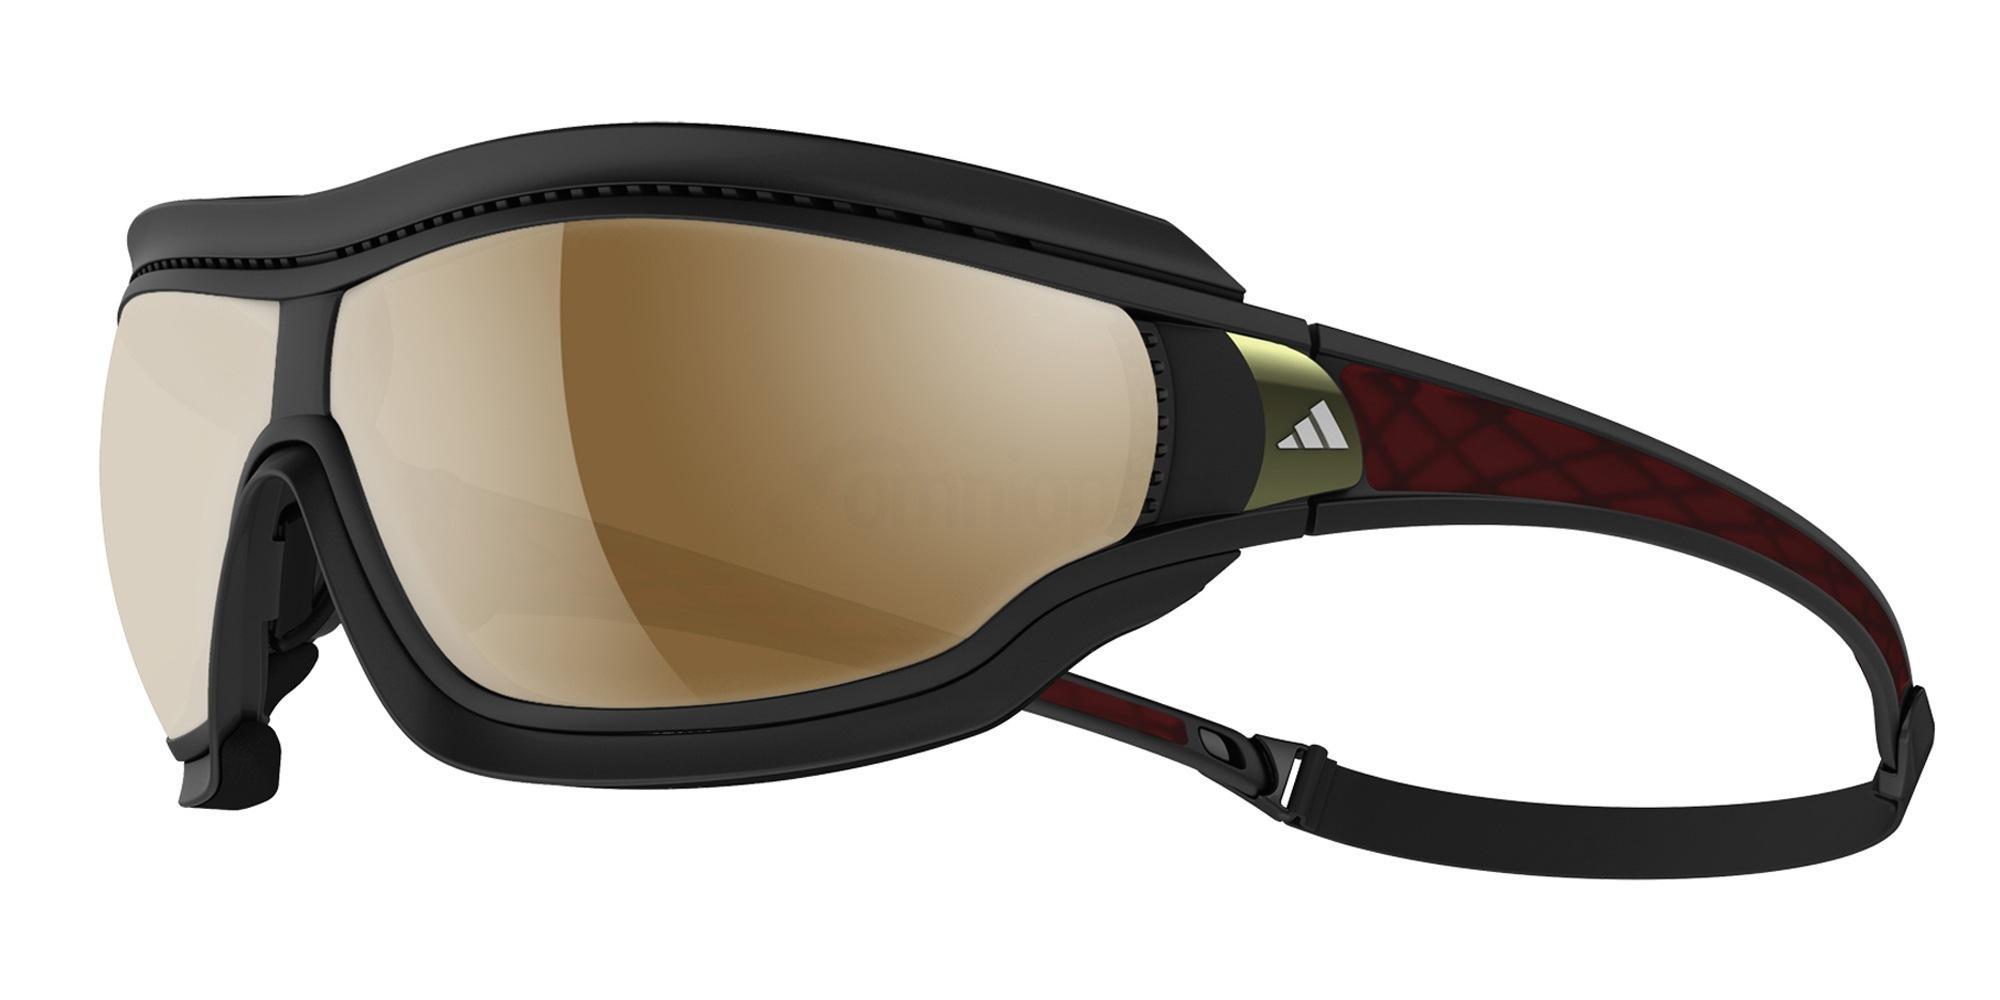 a197 00 6050 a197 Tycane Pro Outdoor S Sunglasses, Adidas